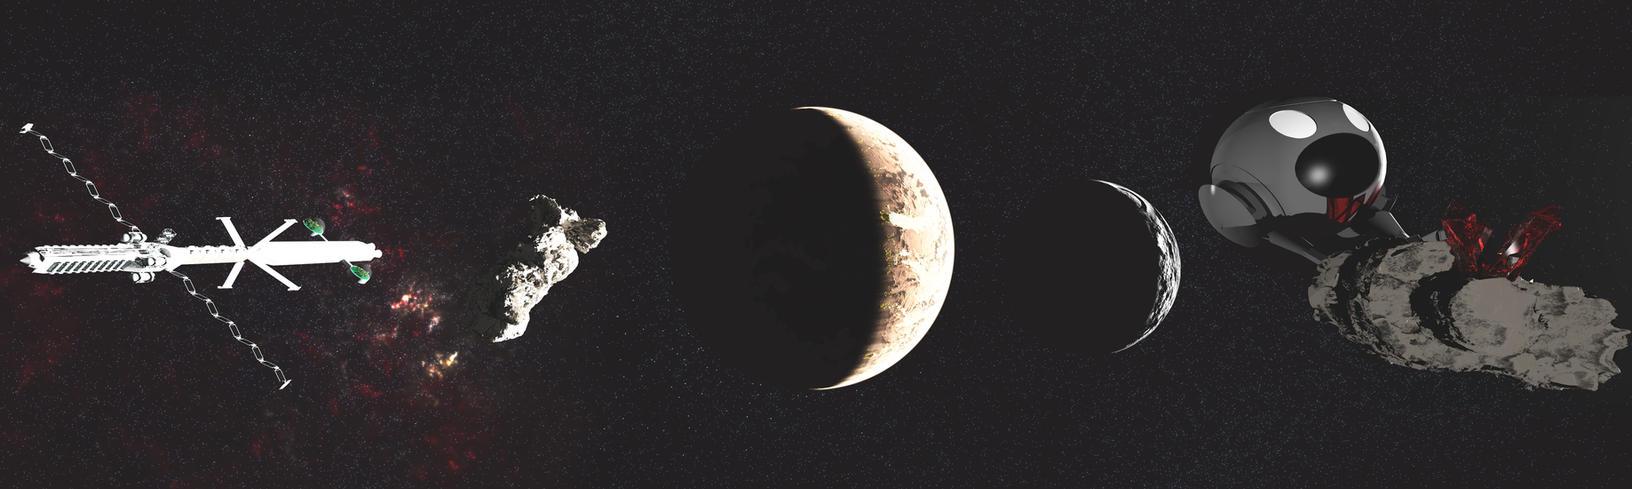 space ship vue VOB file by ONLYoneCANNOLI